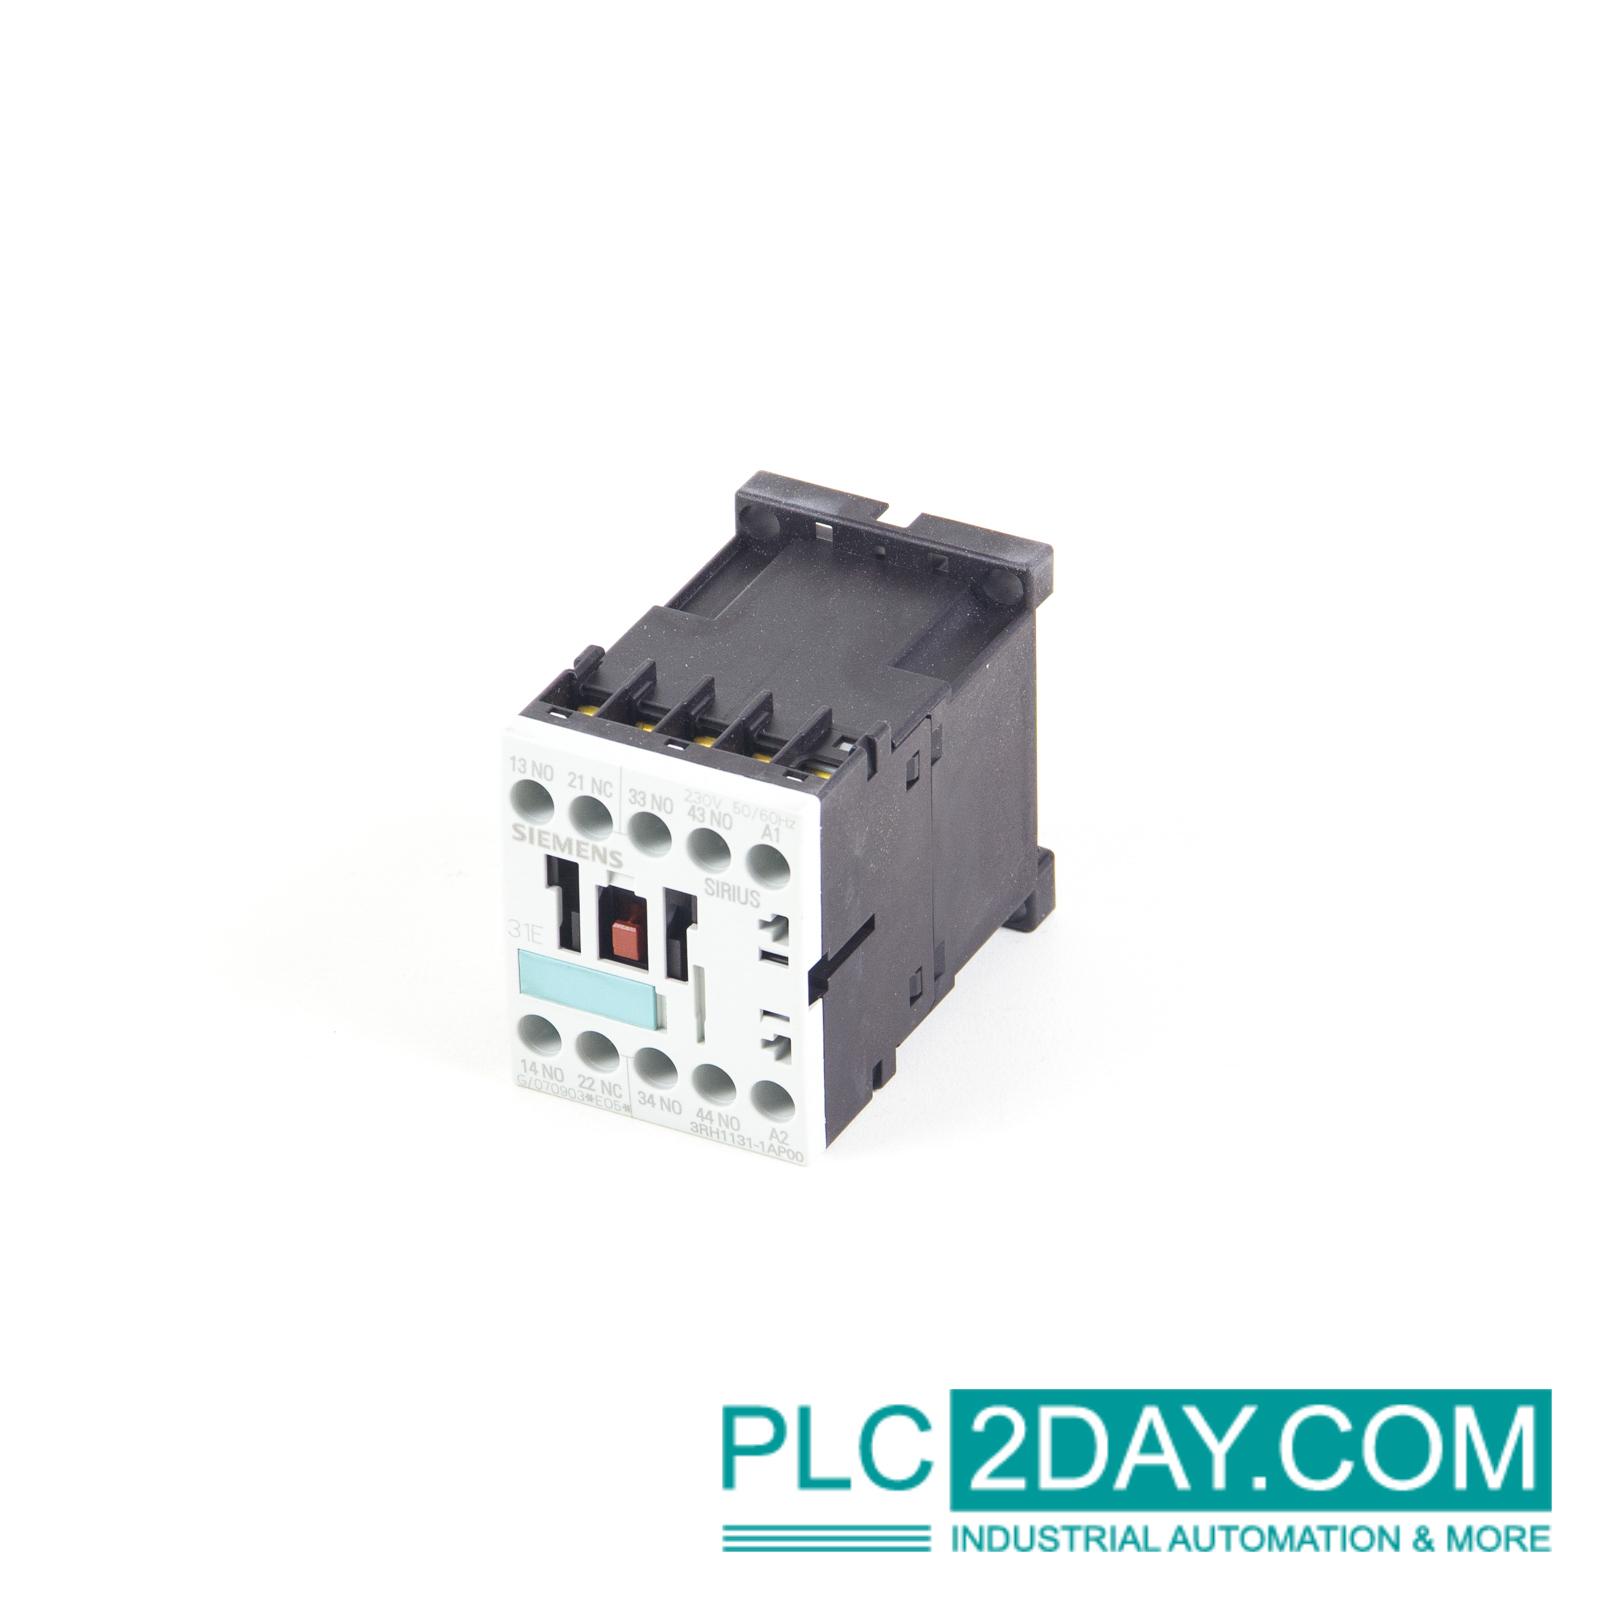 1pc Siemens contactor relay 3RH1131-1AP00